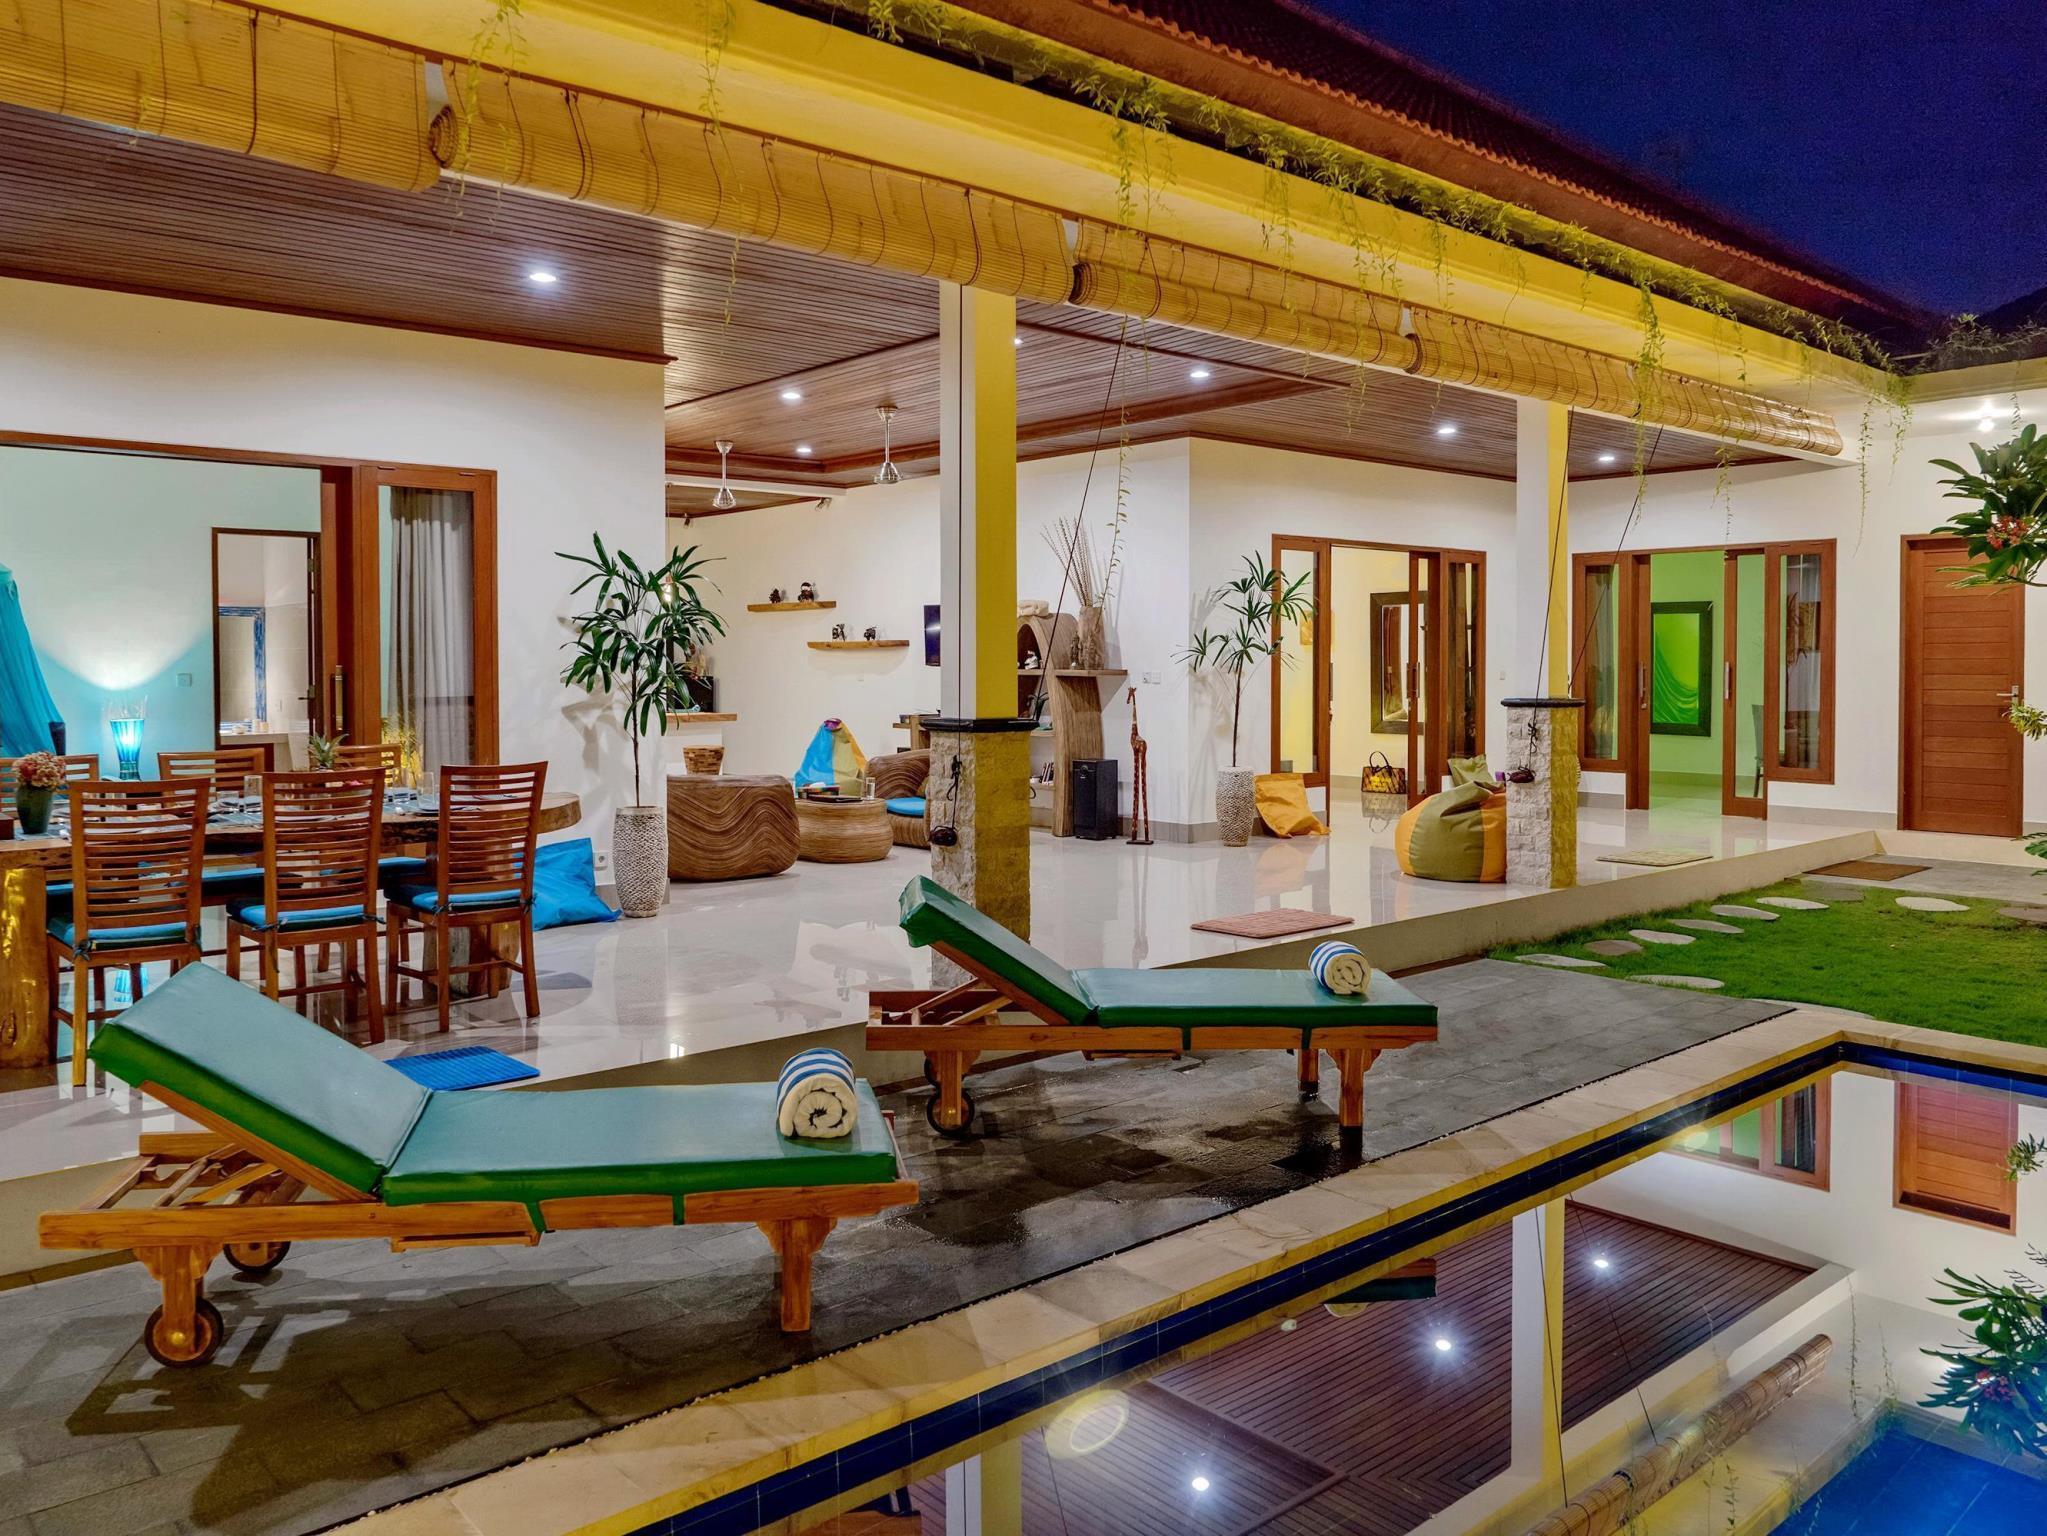 Villa MasBro in Bali - Room Deals, Photos & Reviews